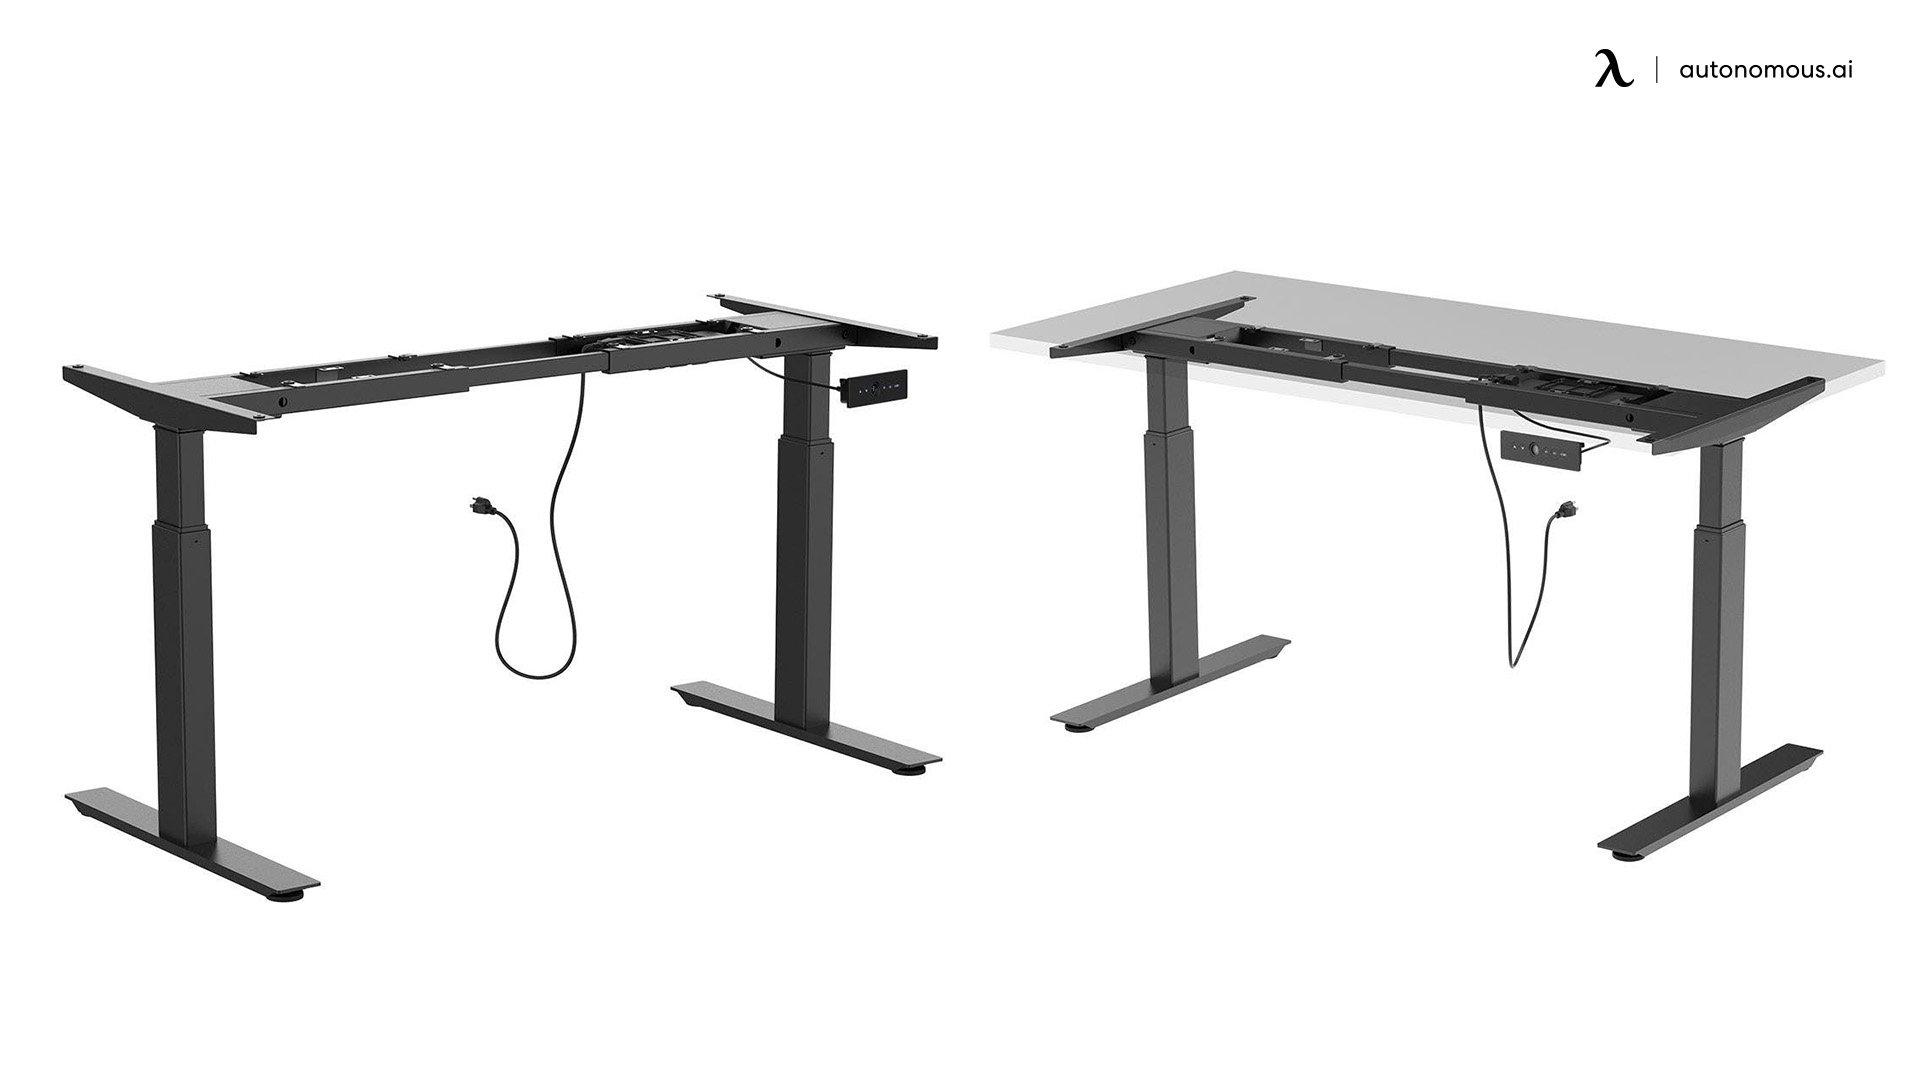 Monoprice Dual Desk Frames